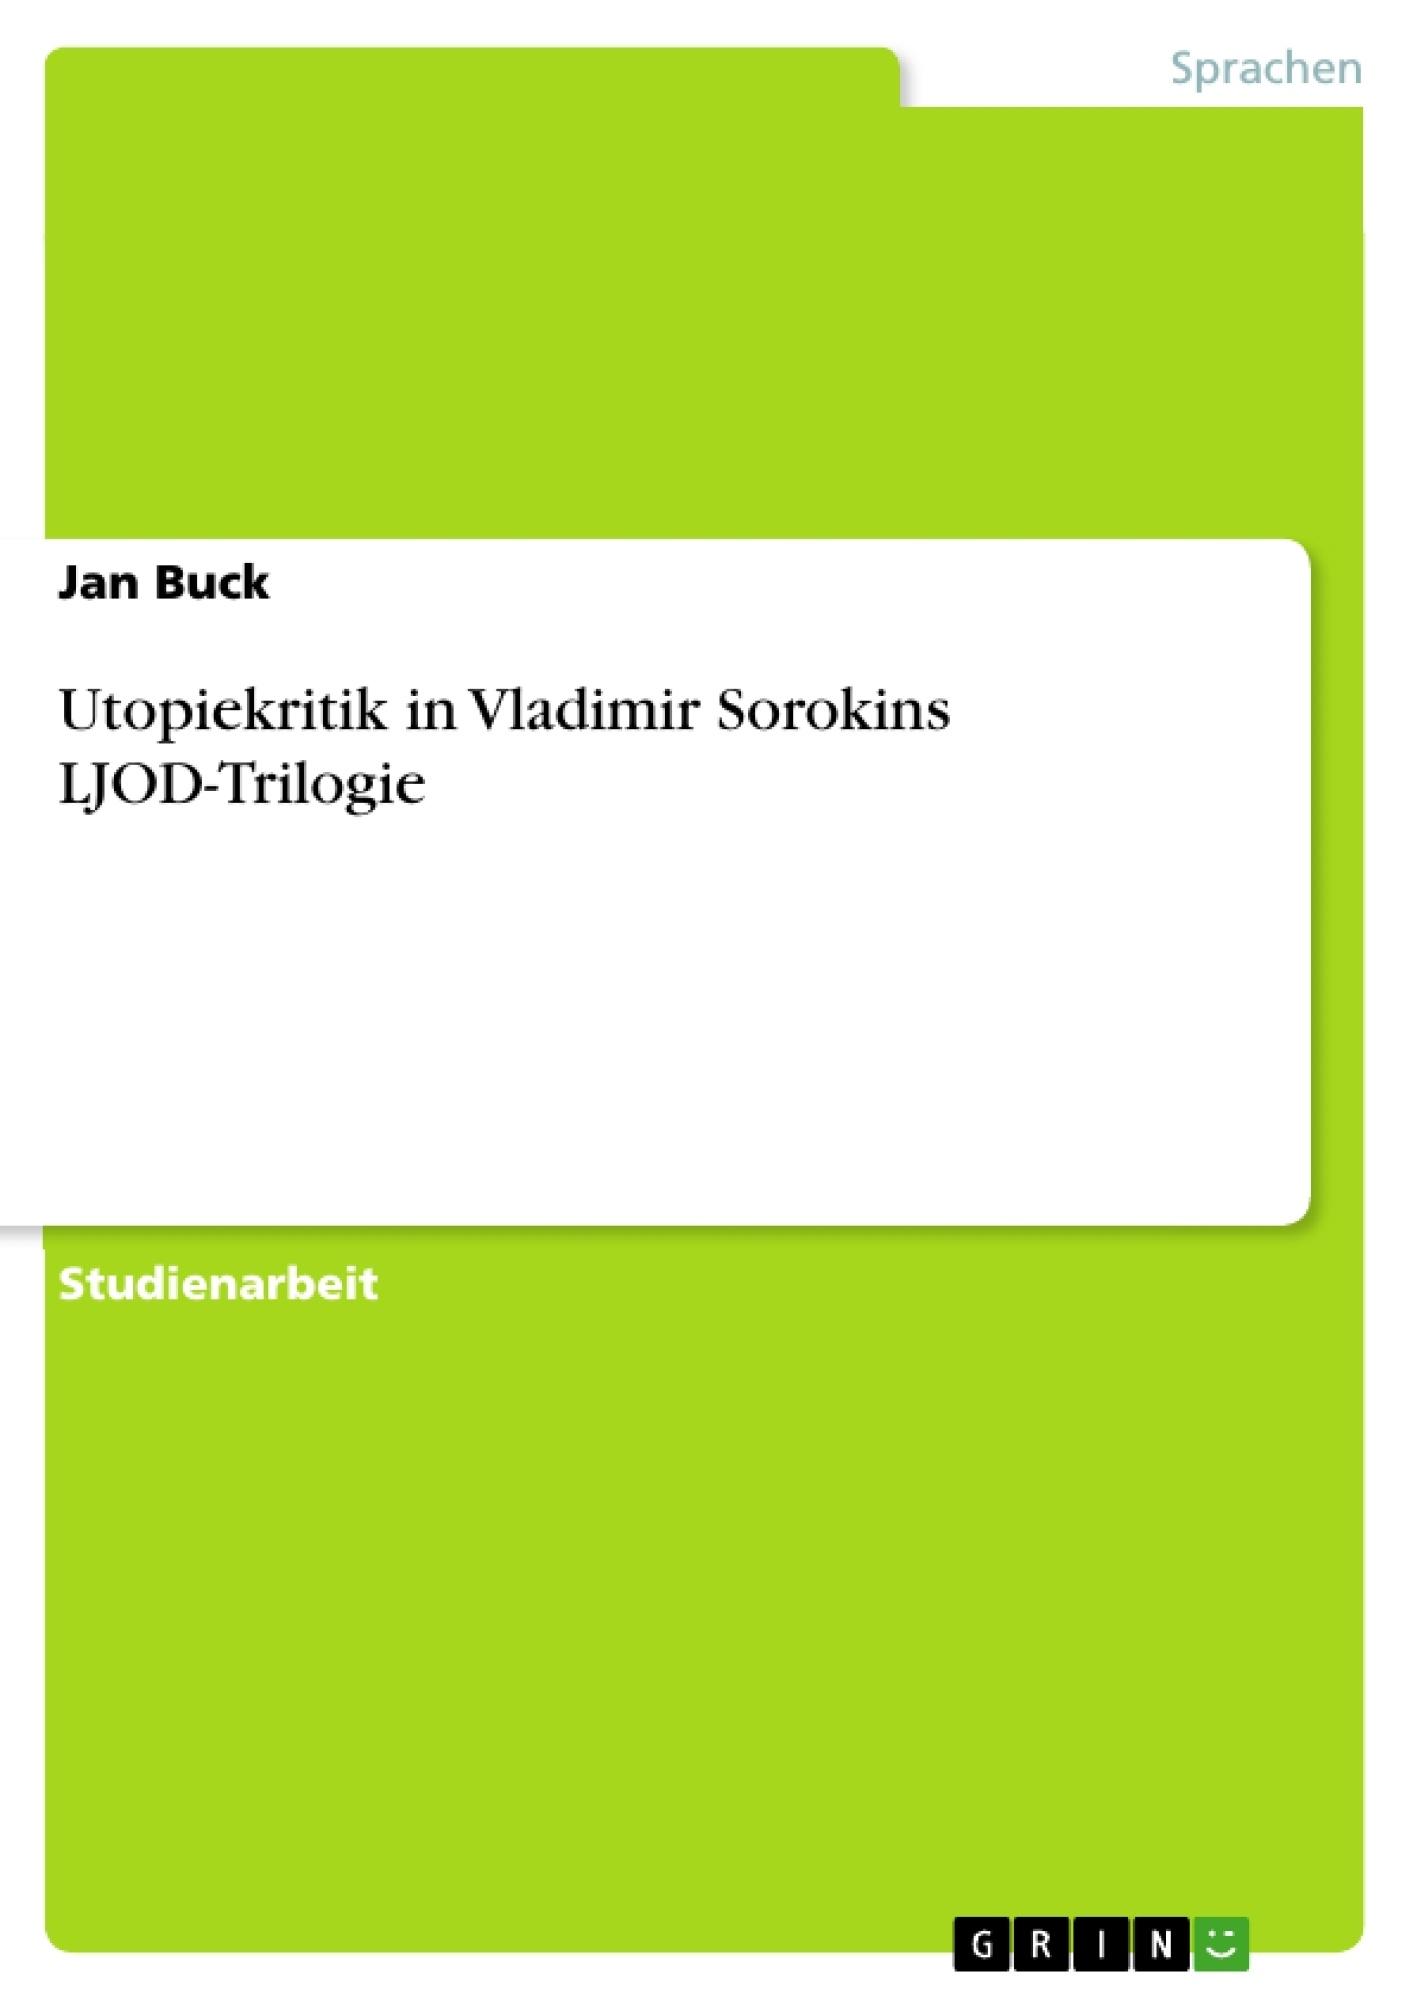 Titel: Utopiekritik in Vladimir Sorokins LJOD-Trilogie